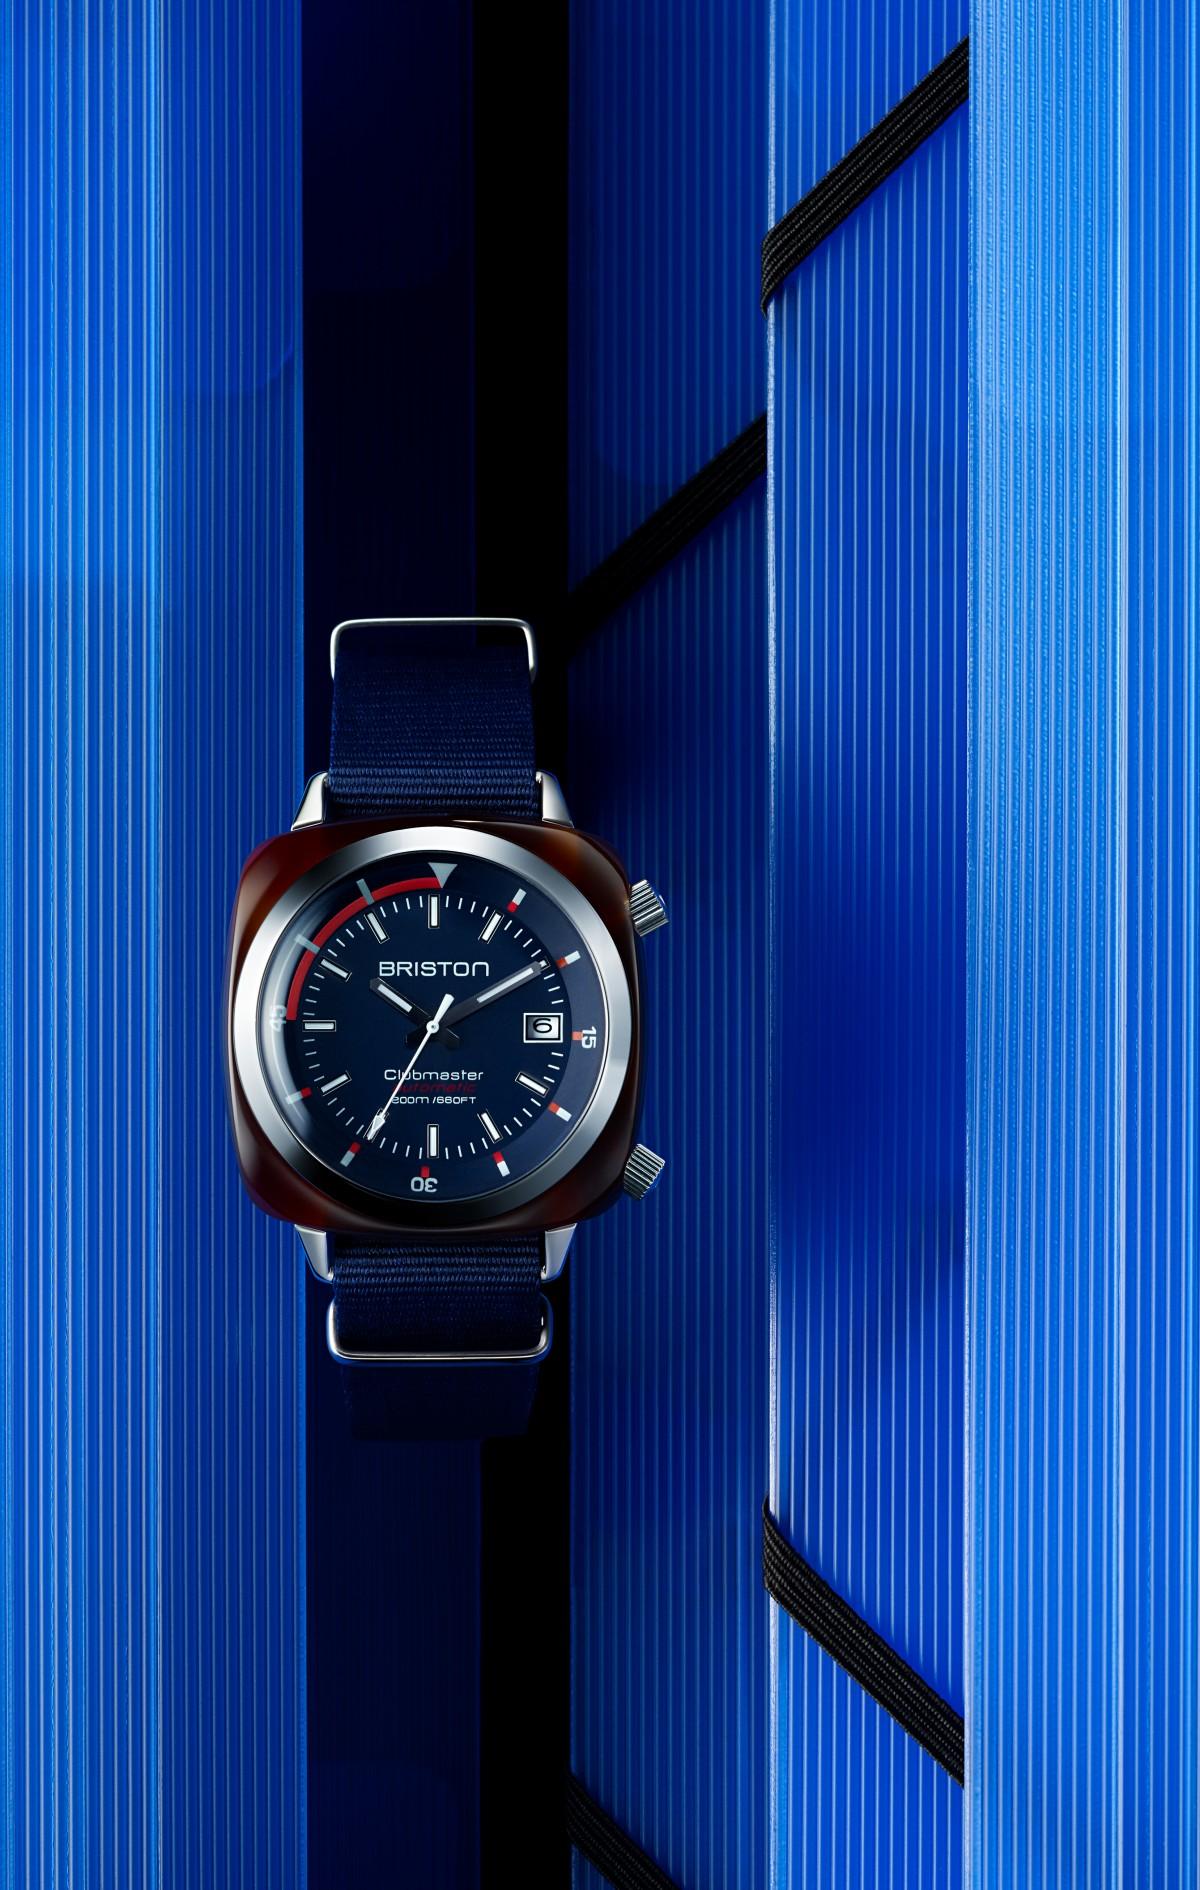 Briston-Revue des montres#01